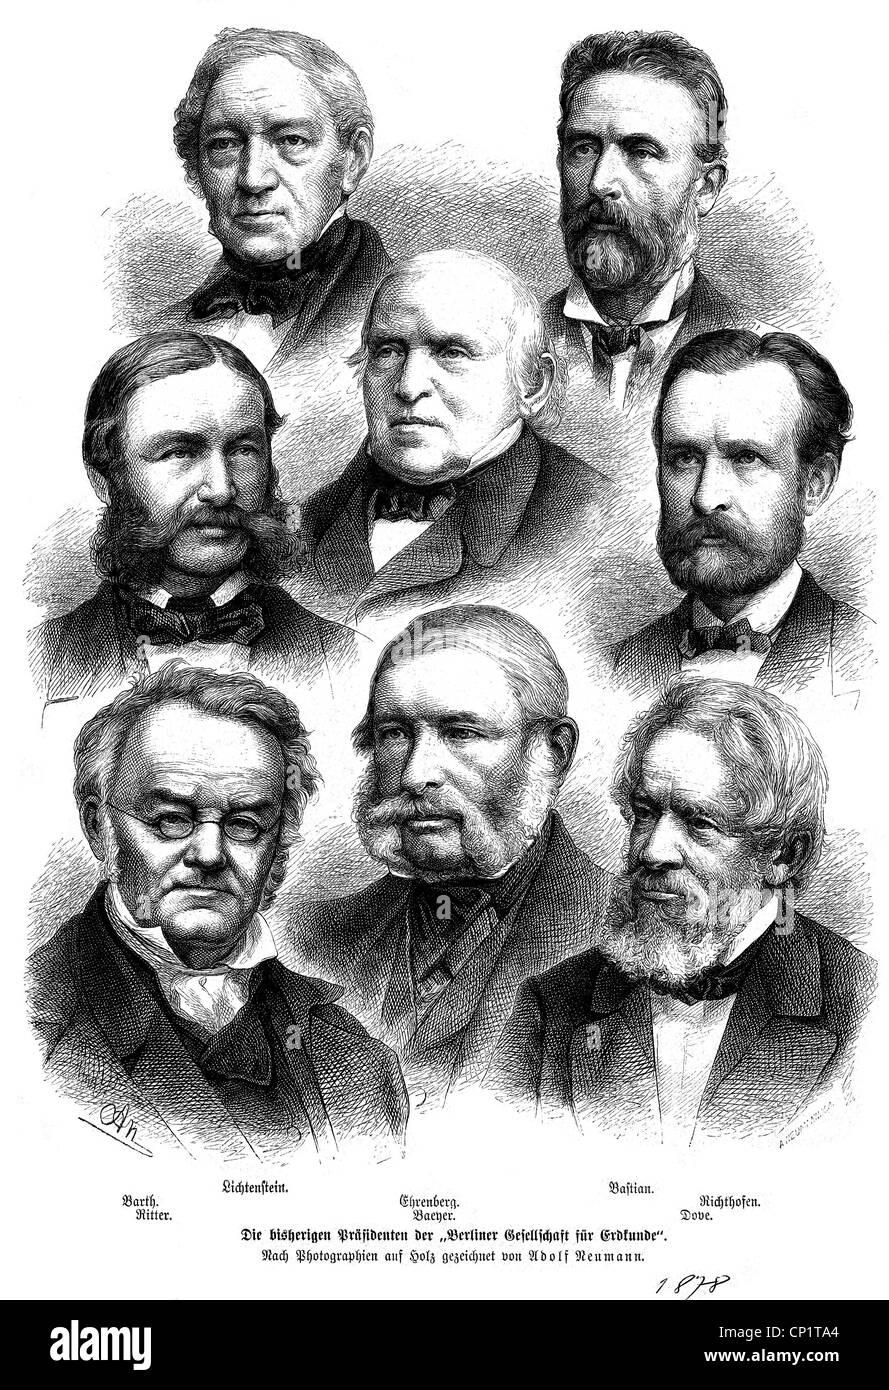 science, geography, presidents of the Gesellschaft fuer Erdkunde zu Berlin (Society for Geography in Berlin), Lichtenstein, - Stock Image